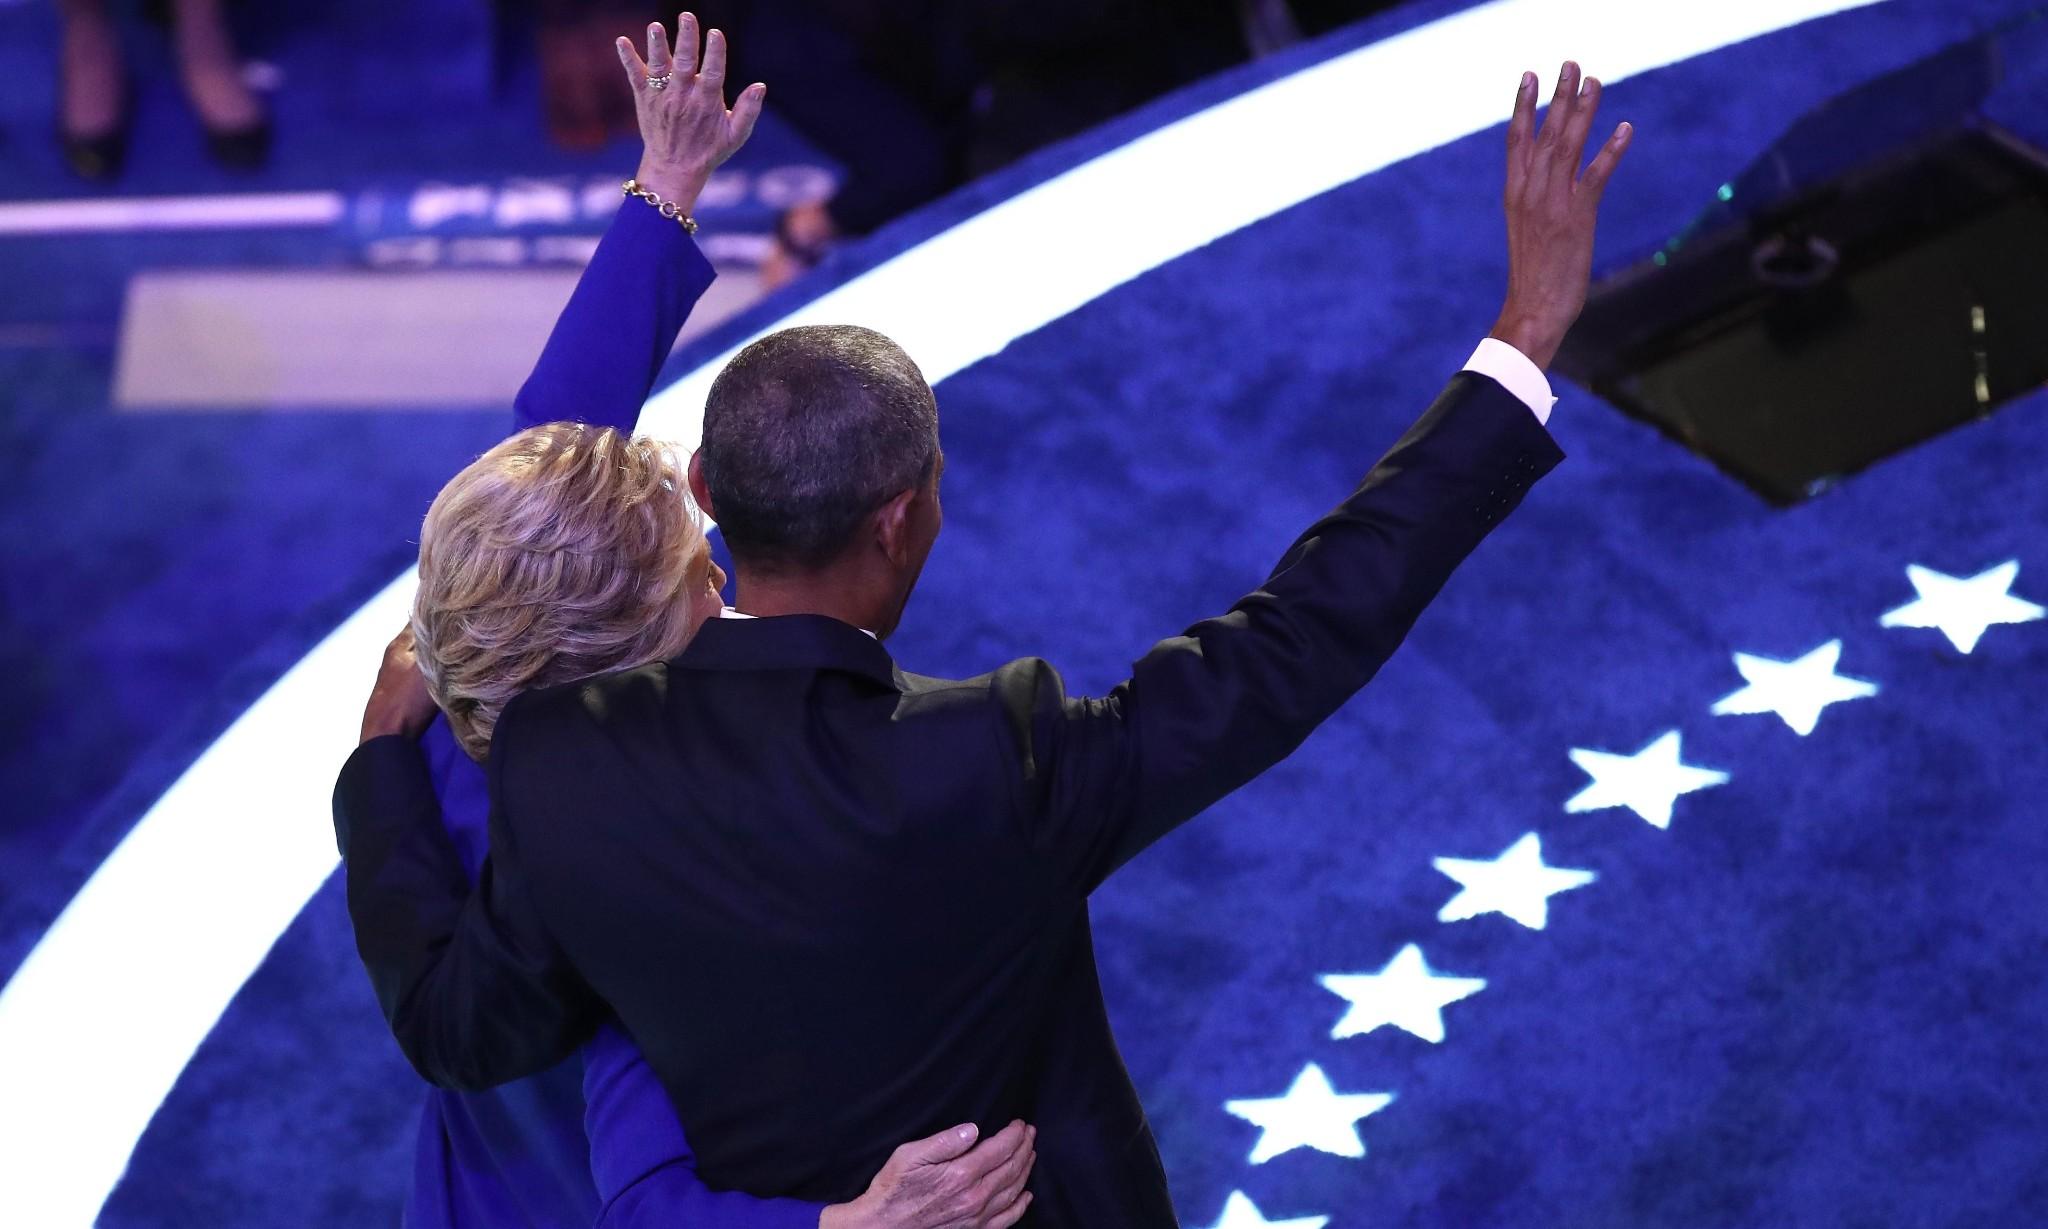 Emotional Obama bids long goodbye and passes baton of hope to Clinton